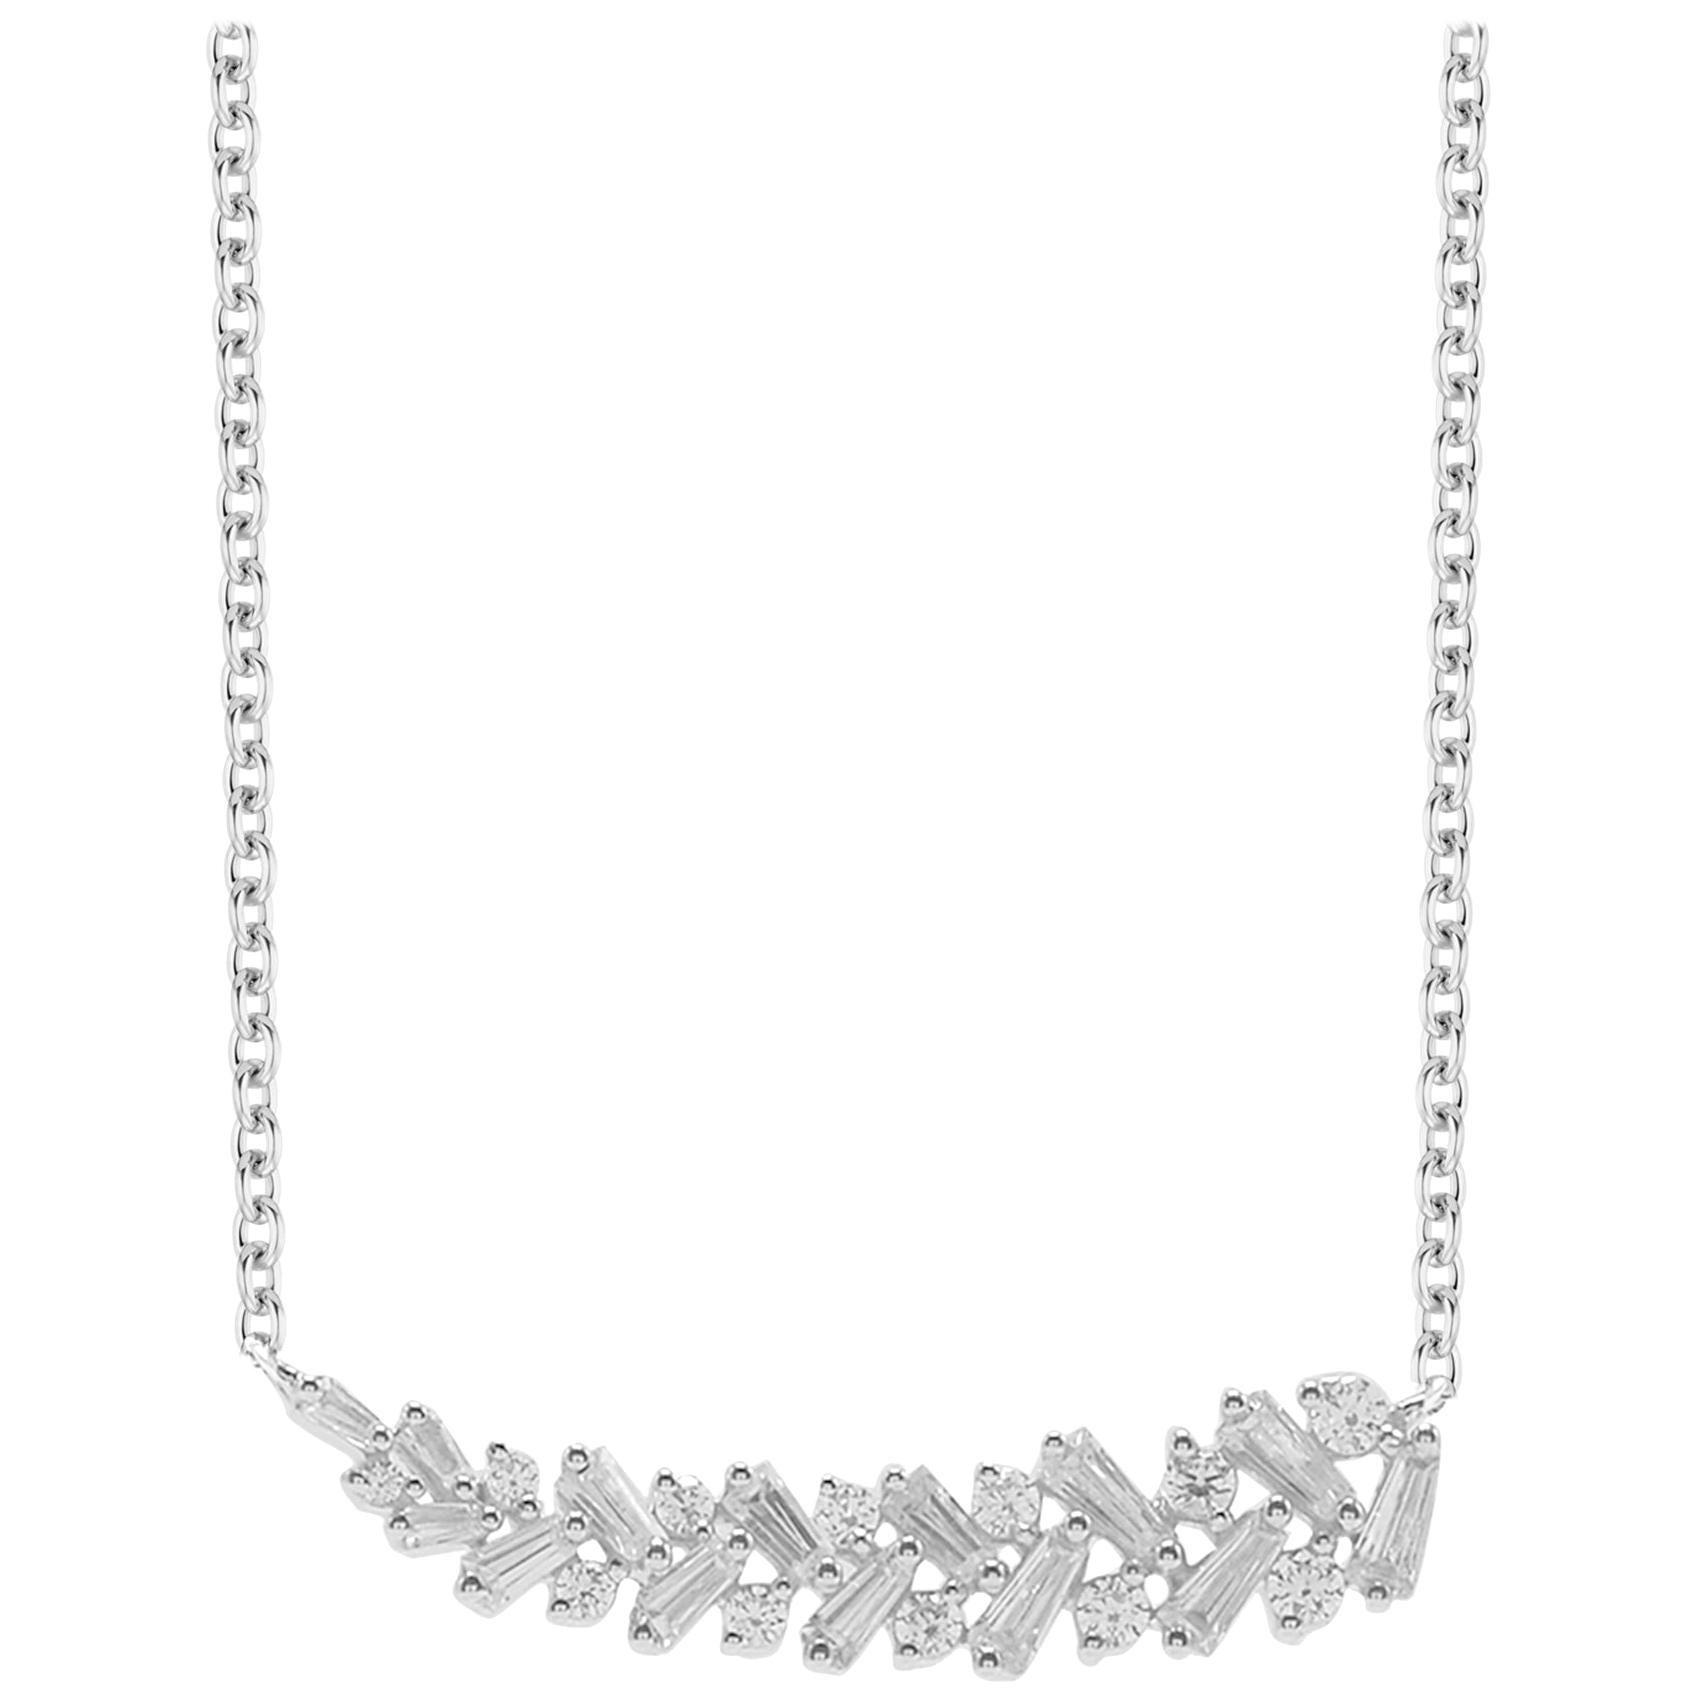 TJD 0.50 Carat Alternating Round & Baguette Diamond 14 K White Gold Bar Necklace